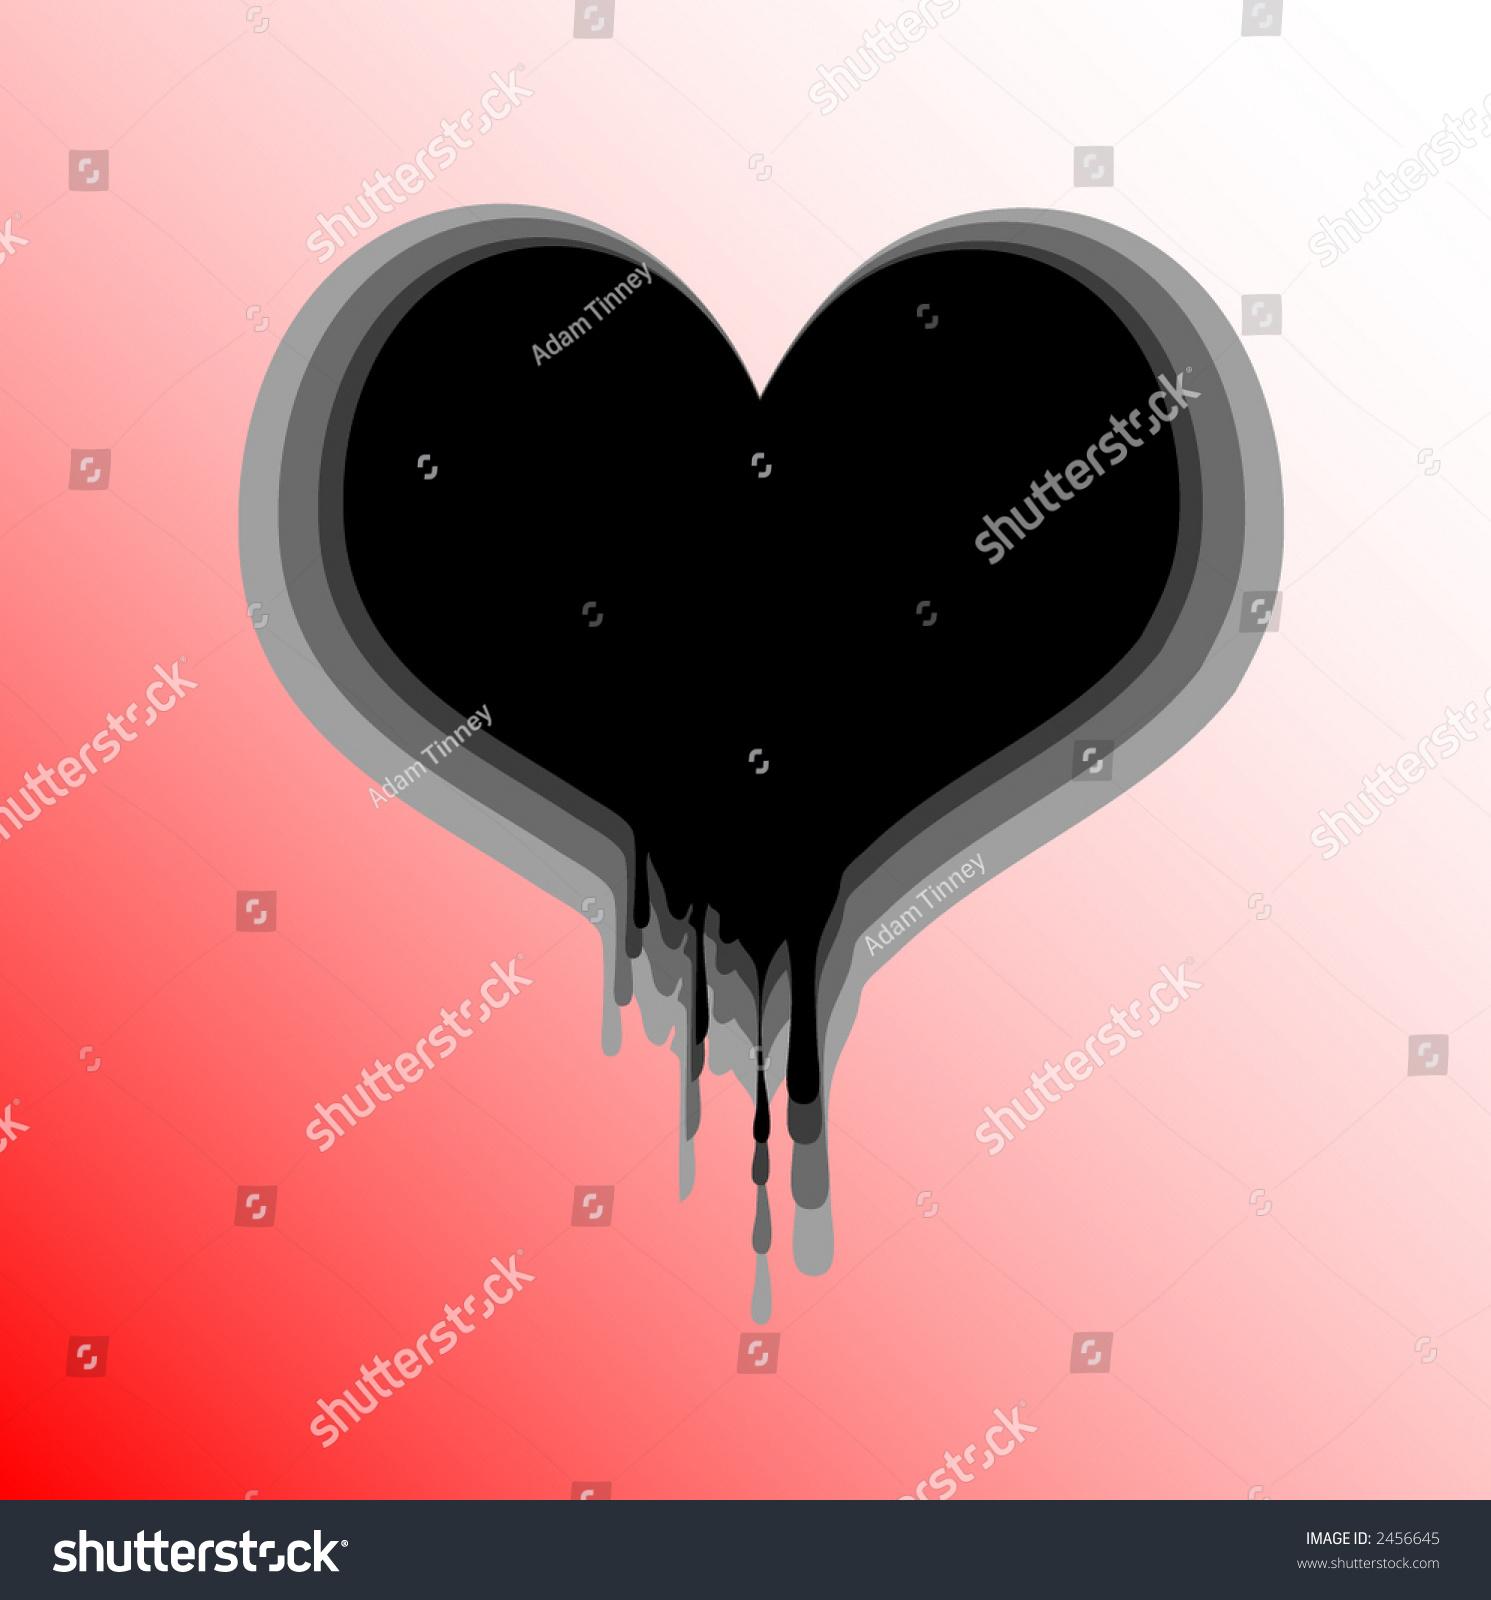 Bleeding heart stock vector 2456645 shutterstock bleeding heart buycottarizona